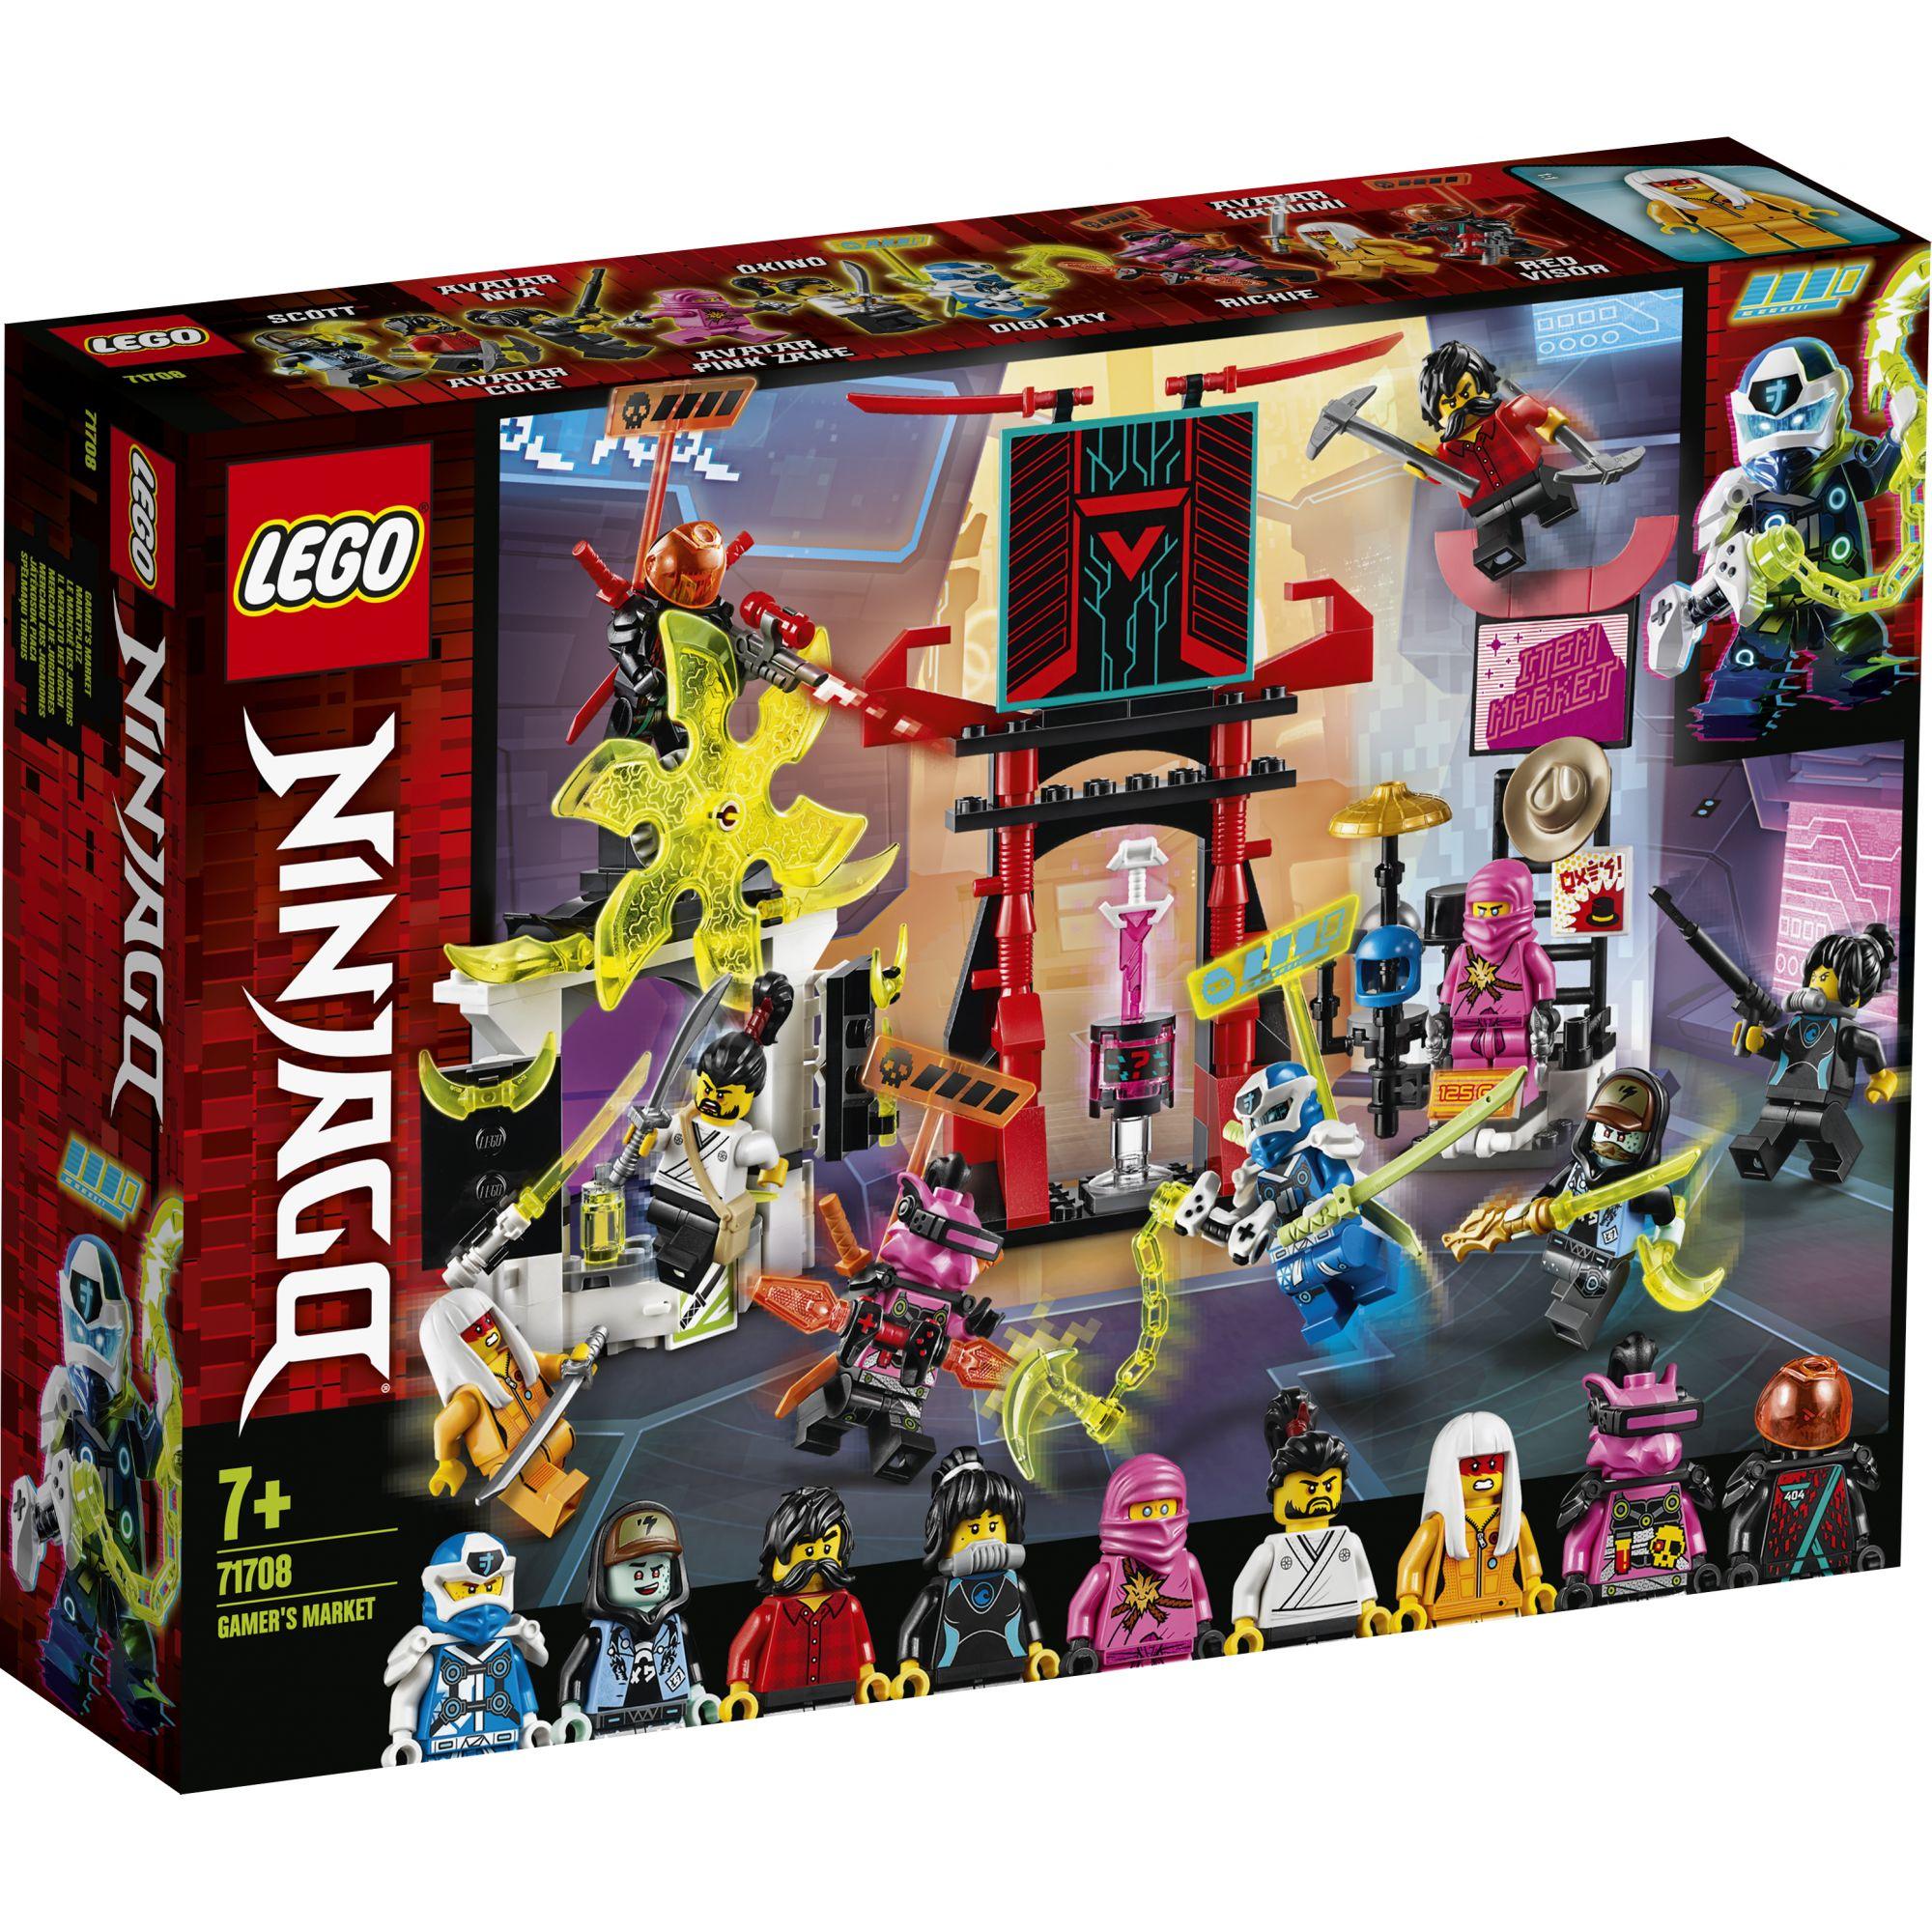 LEGO NINJAGO Il Mercato dei Ninja Gamers - 71708 LEGO NINJAGO